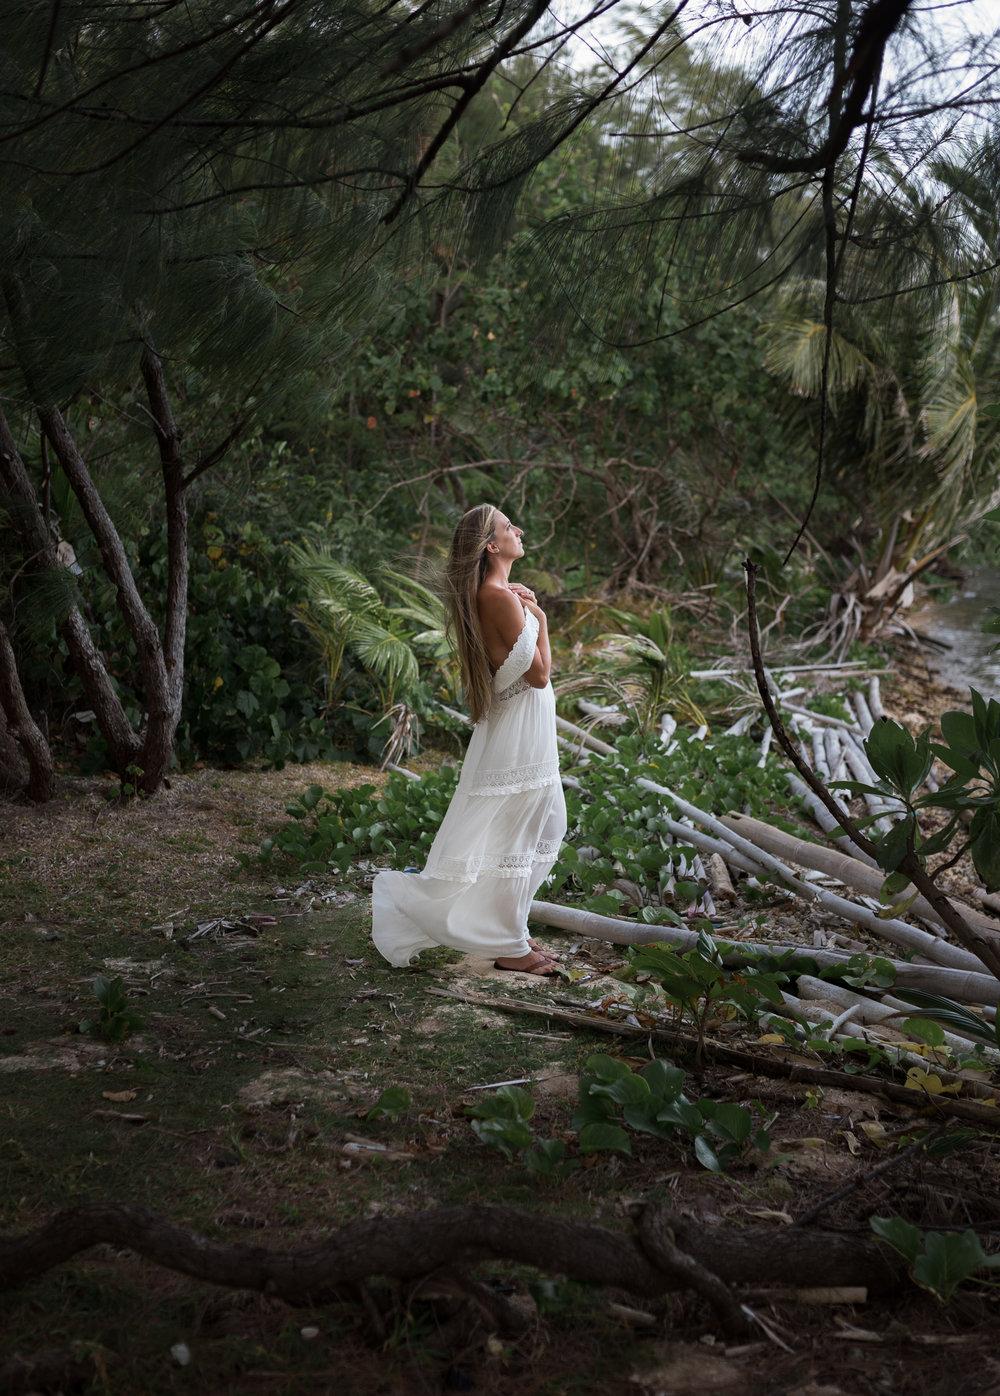 woman-guam-portrait-photographer-ipan-roxanne-augusta-6.jpg